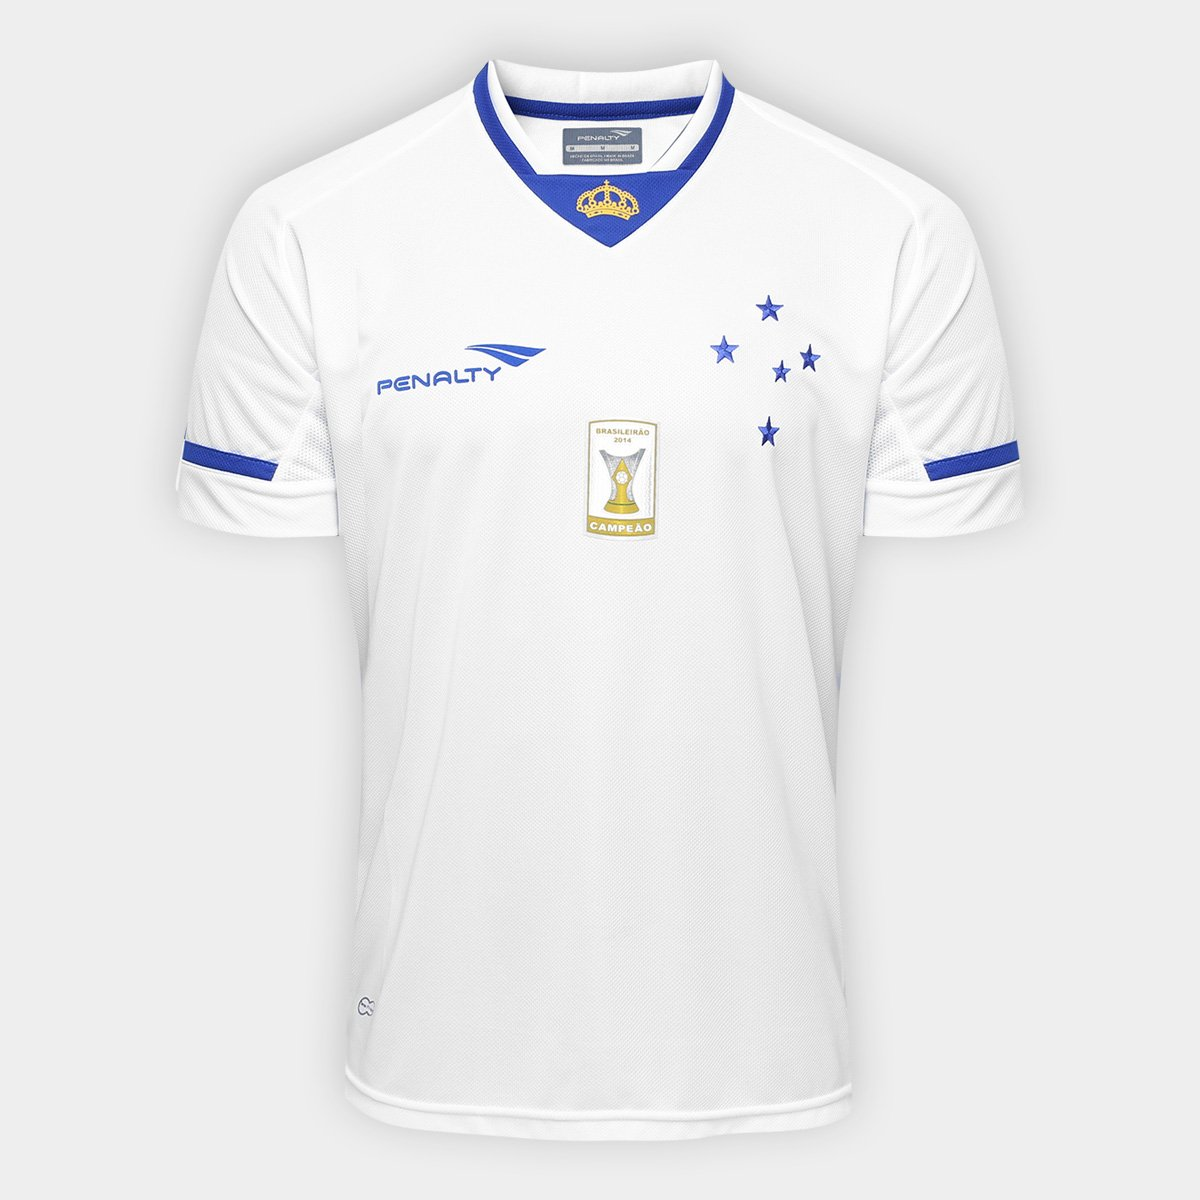 d3ca22d27eaa0 Camisa Penalty Cruzeiro II 15 16 s n° Masculina - Compre Agora ...